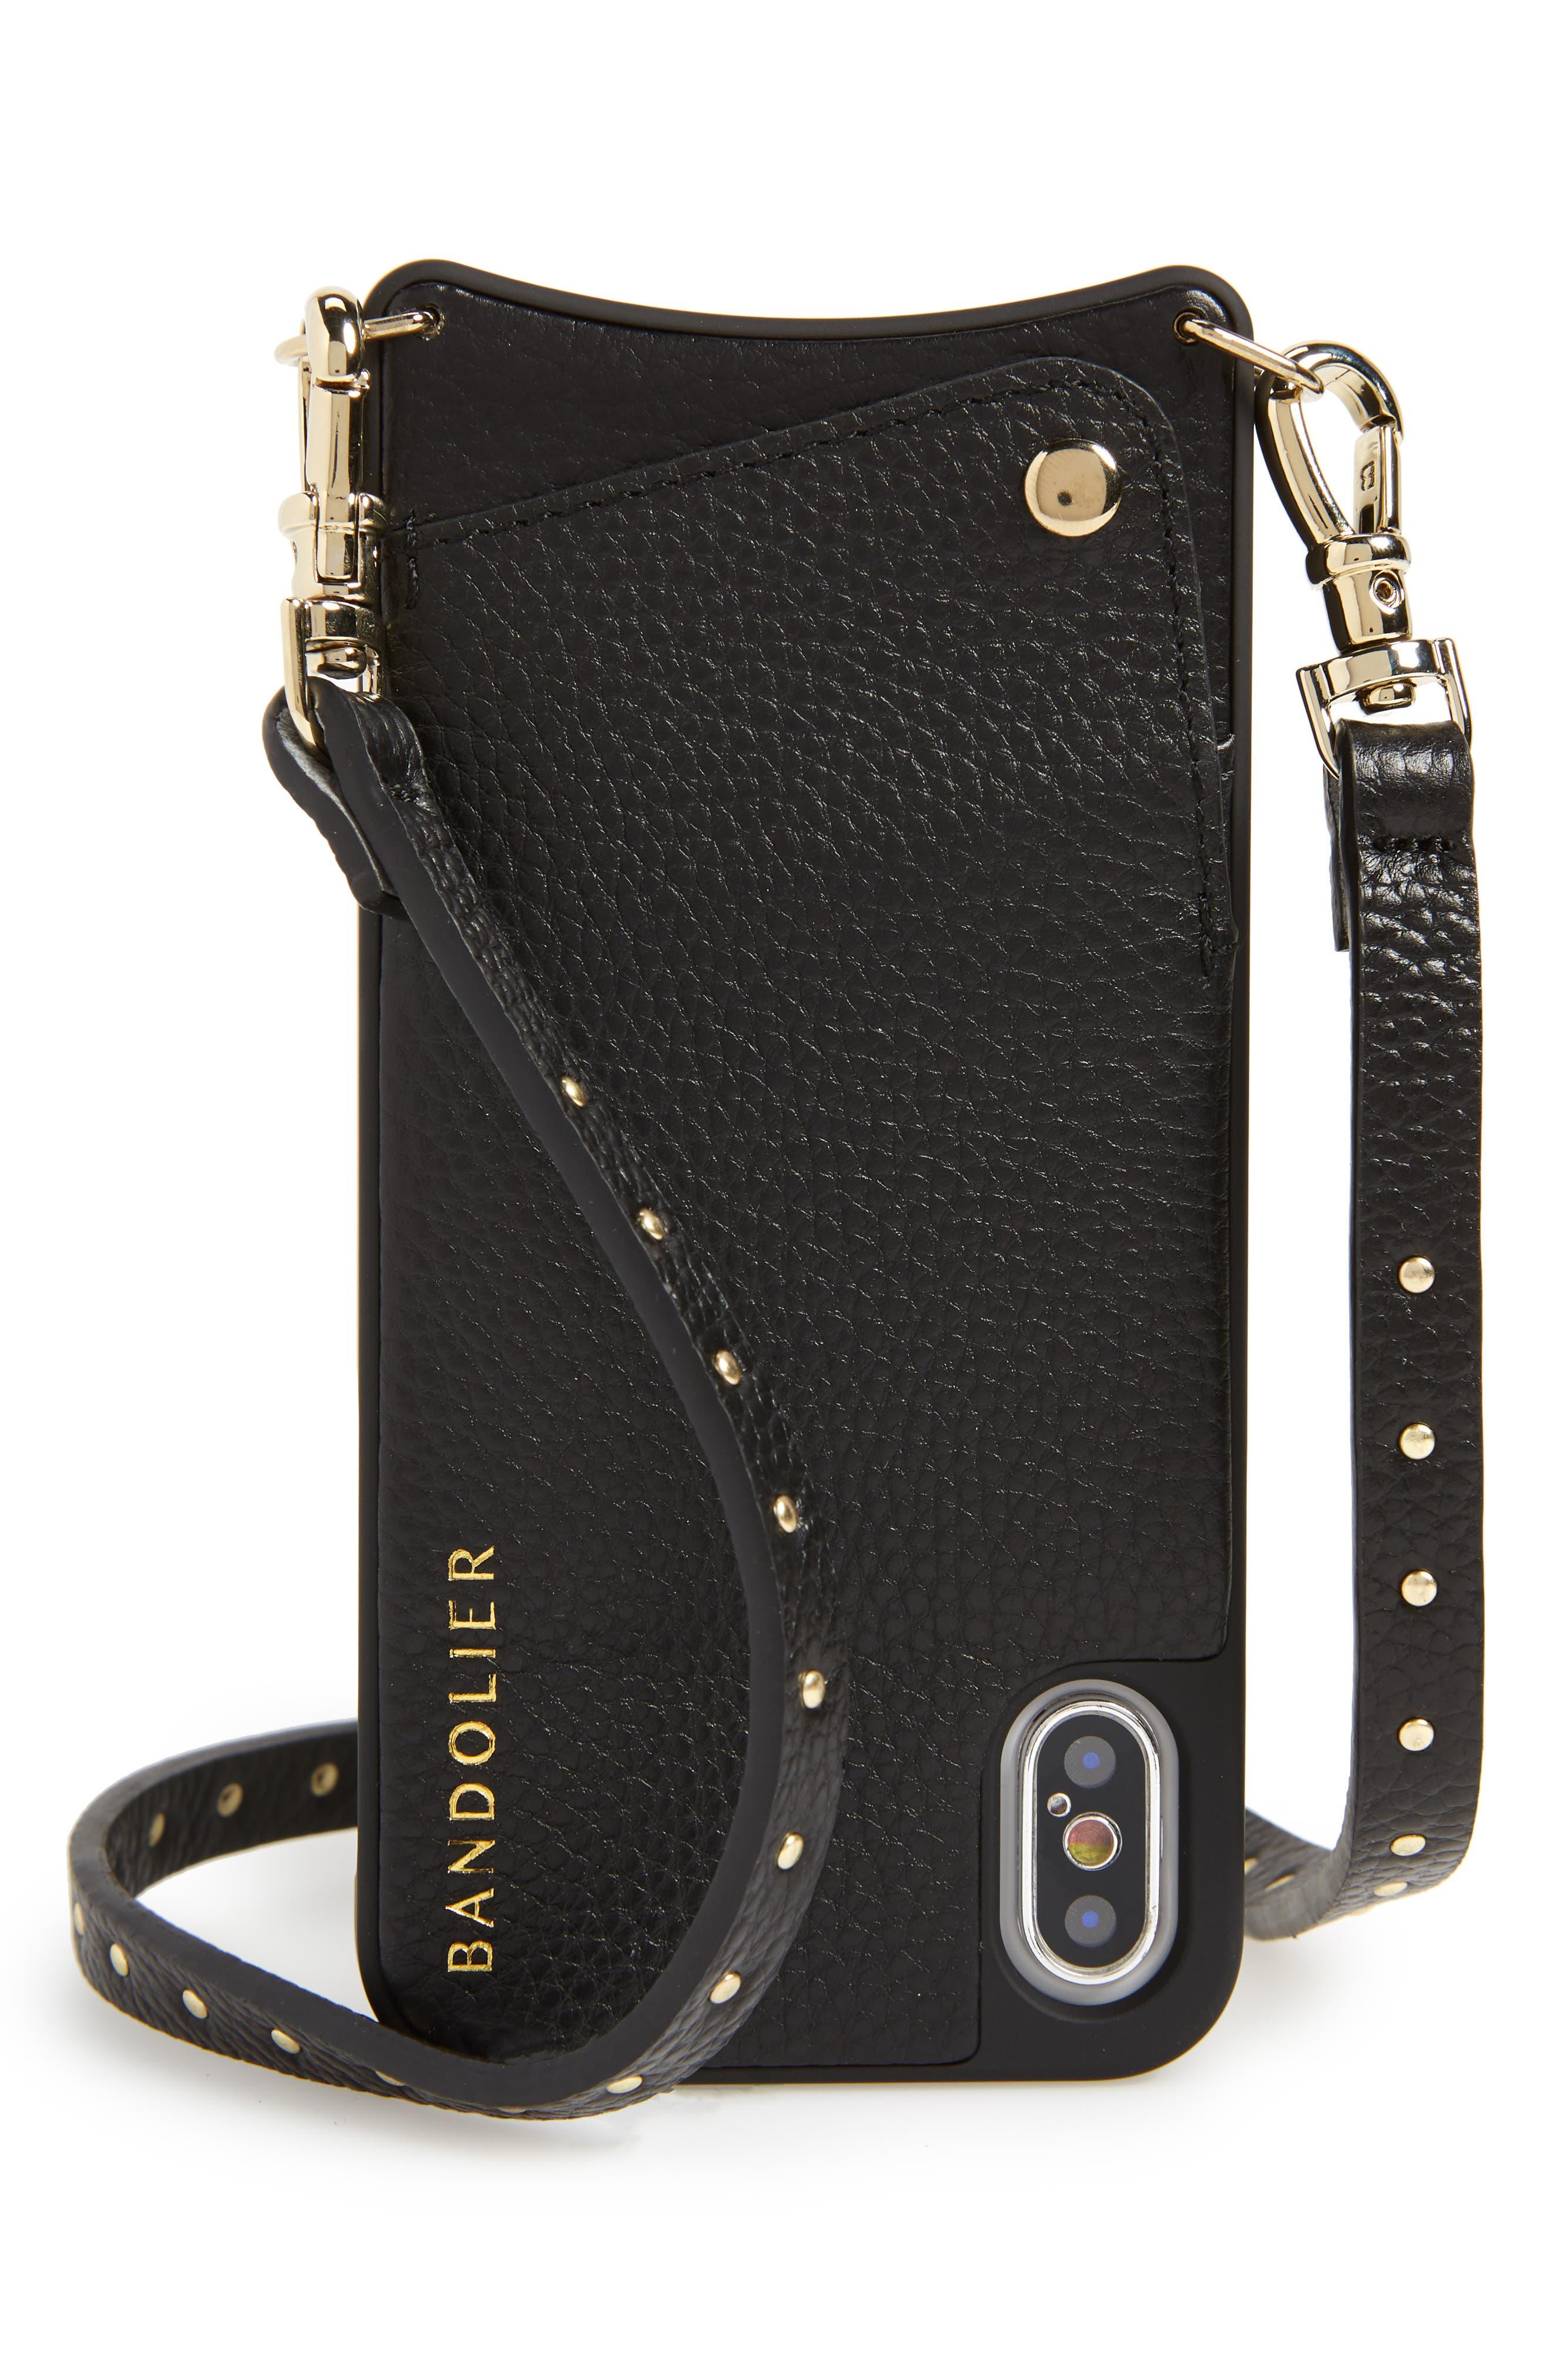 BANDOLIER, Nicole Pebbled Leather 6/7/8 & 6/7/8 Plus Crossbody Case, Main thumbnail 1, color, BLACK/ GOLD